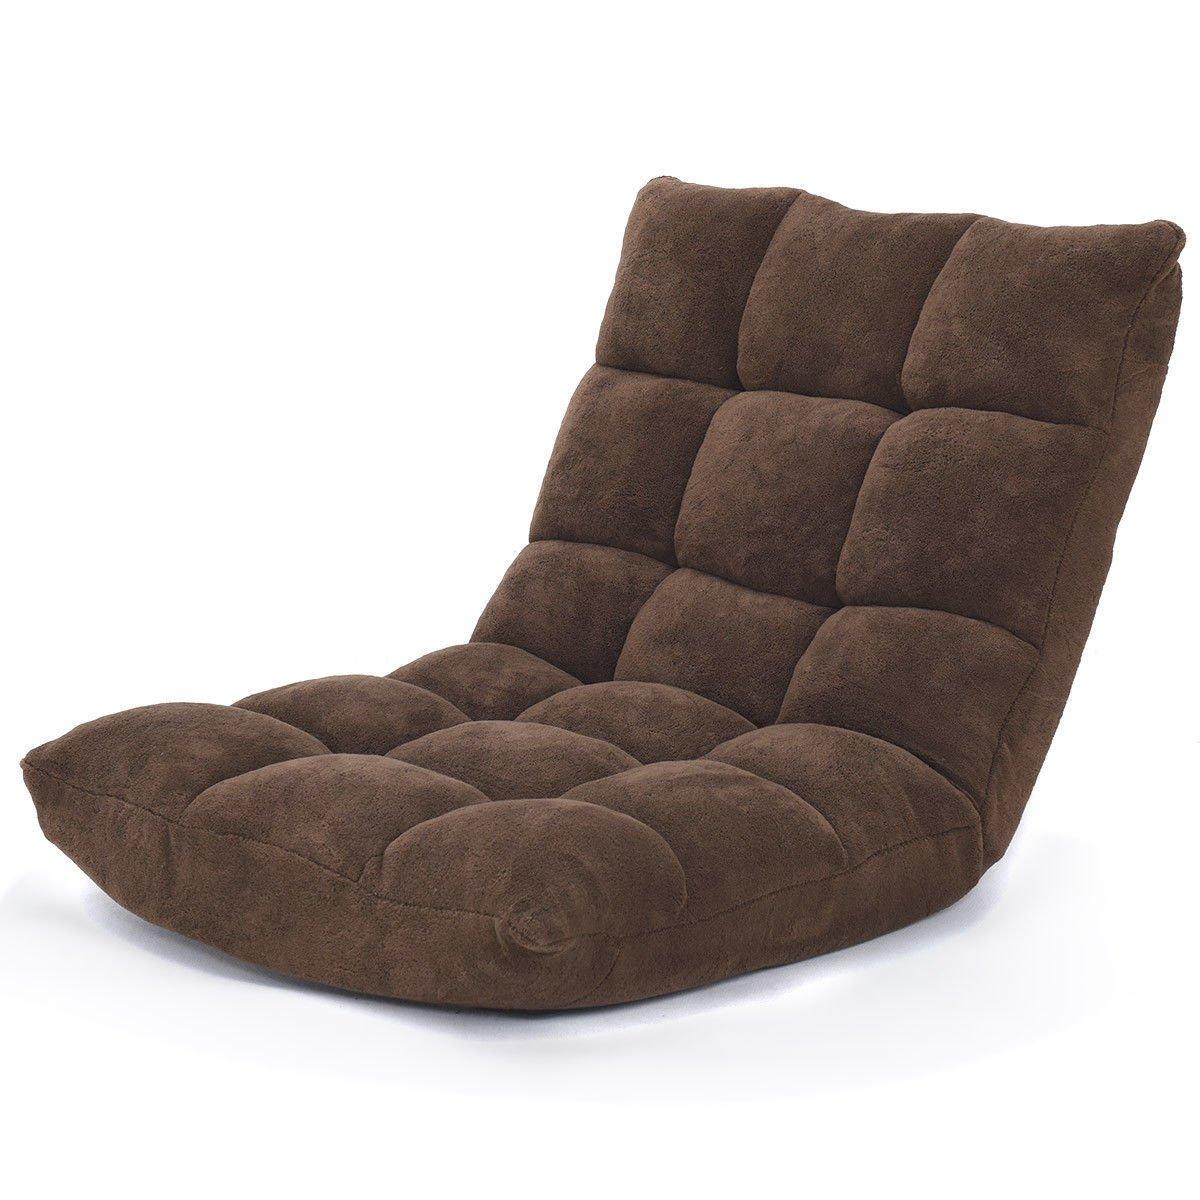 Coffee 41.5'' Folding Floor Chair Cushioned Lazy Gaming Sofa w/14 Position Adjustable